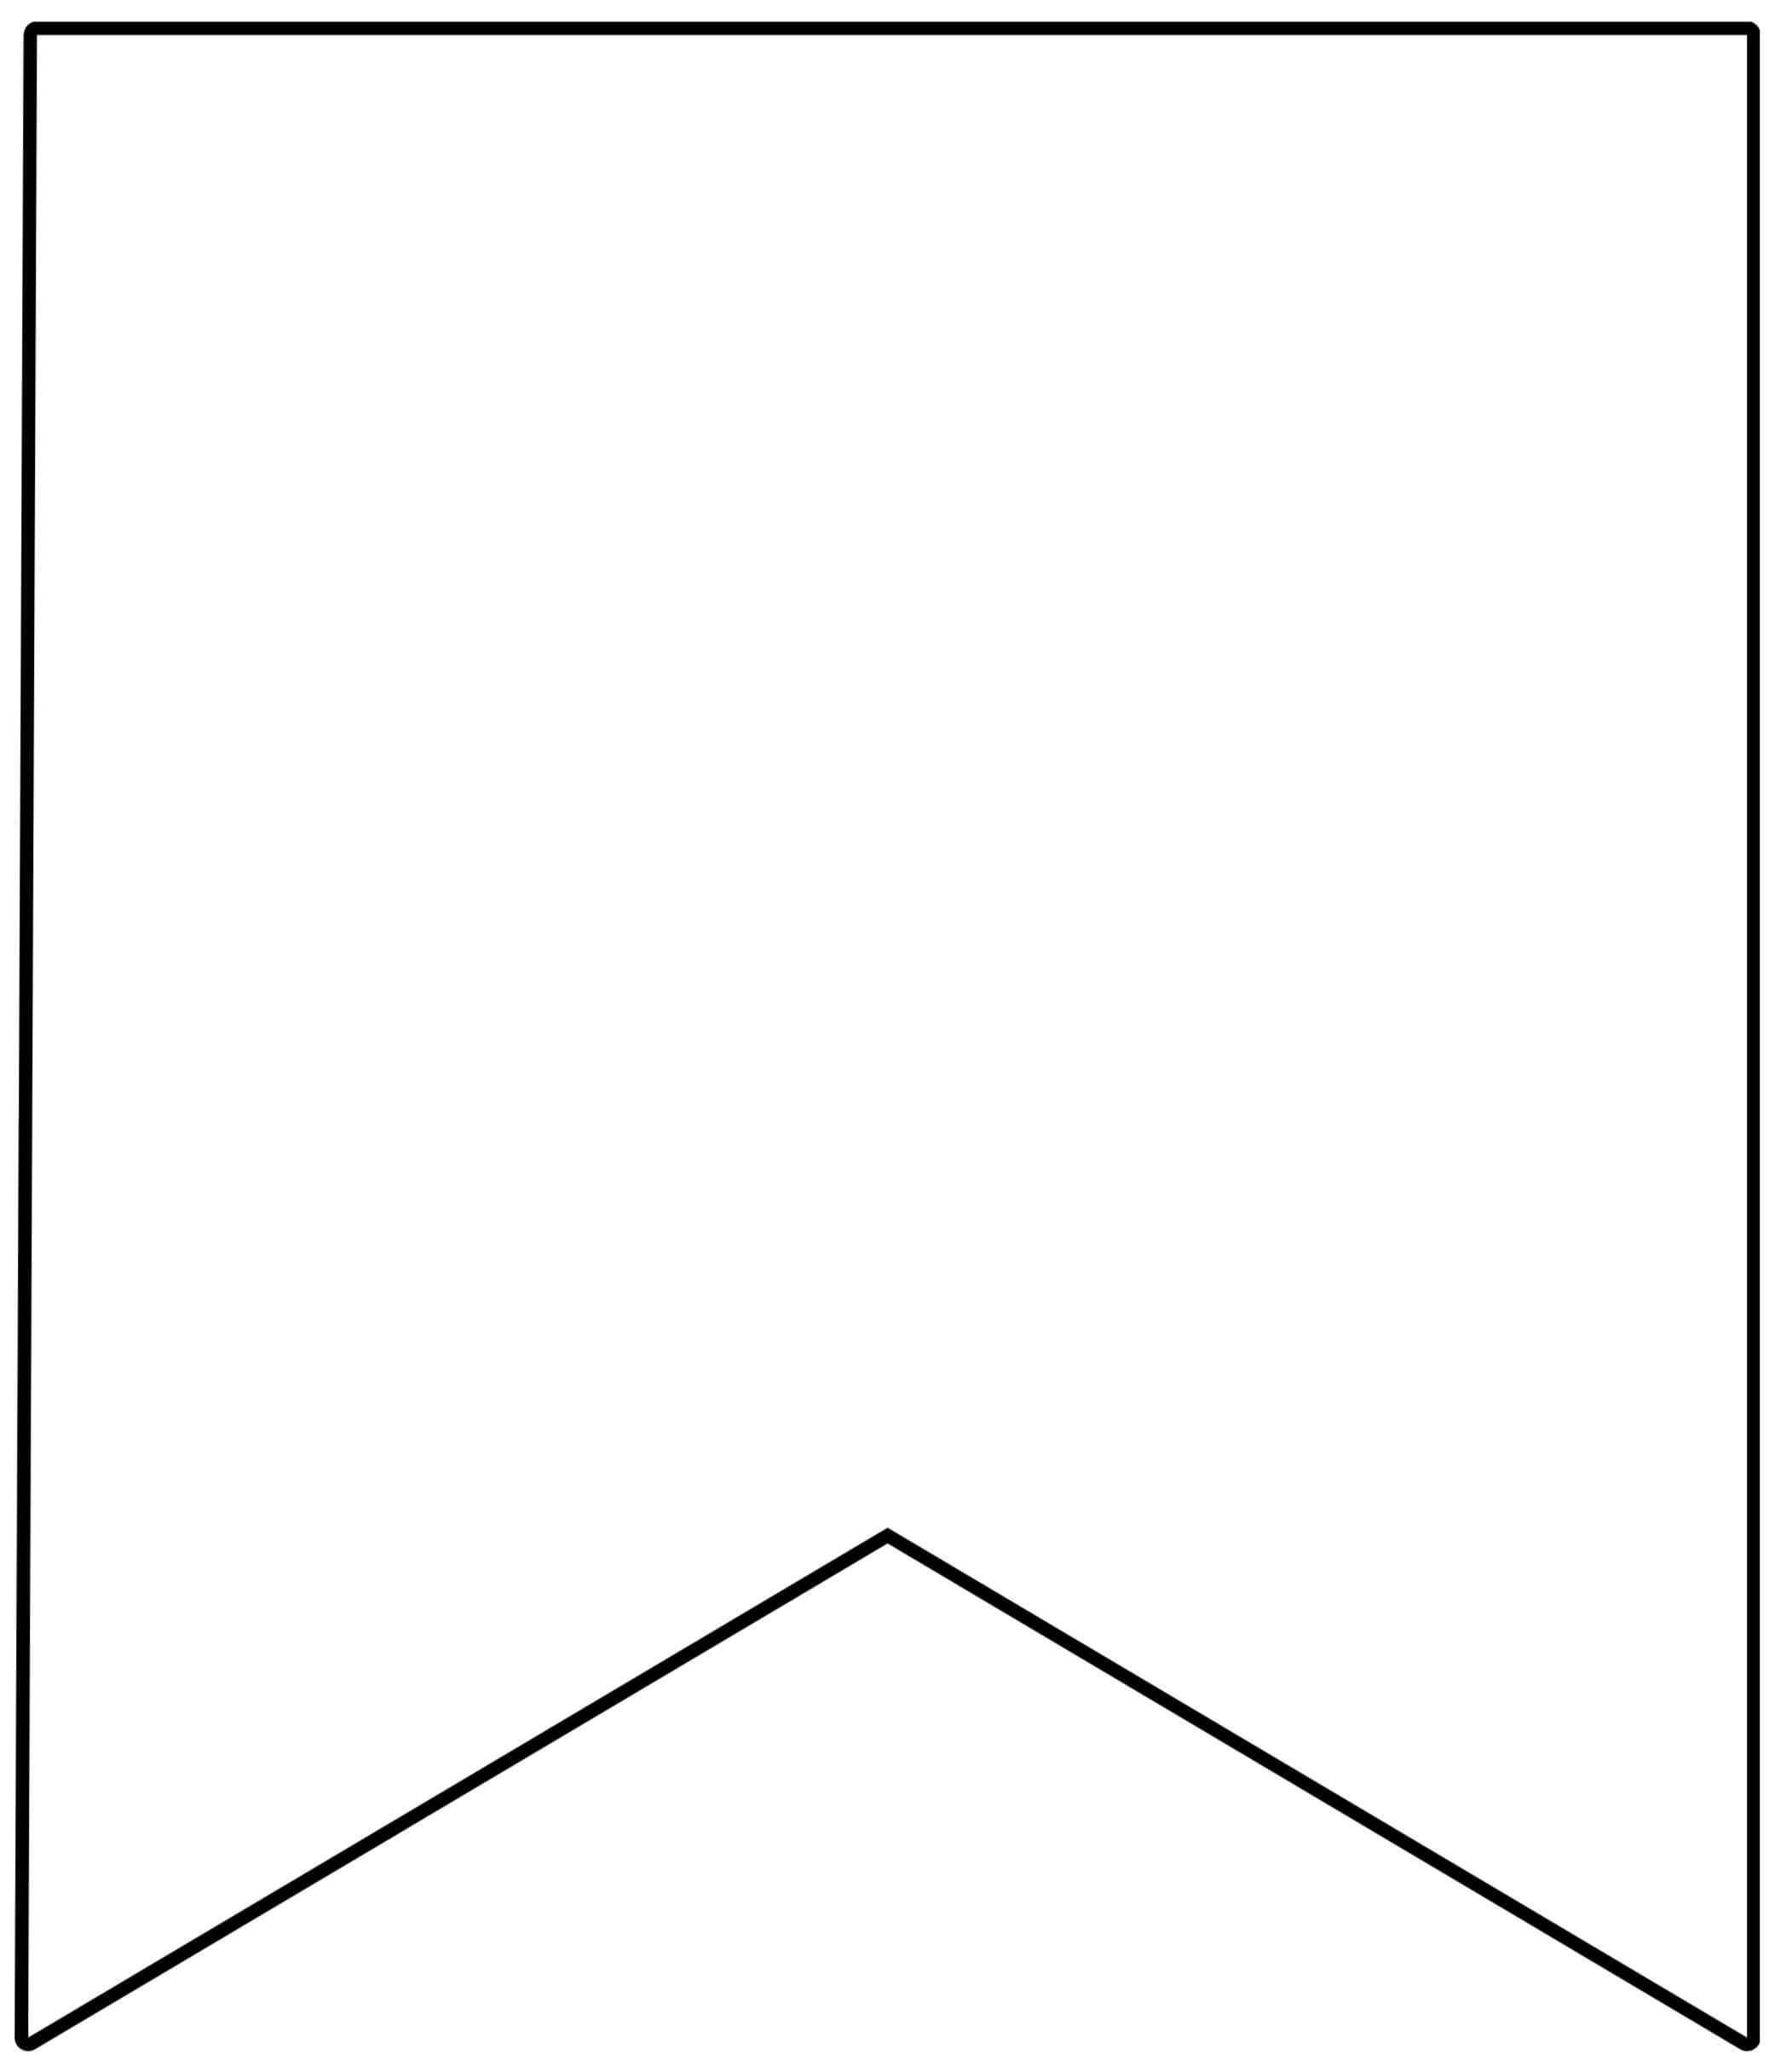 Template Printable Pennant Banner - Epp Acp | Pennant Inside Free Blank Banner Templates